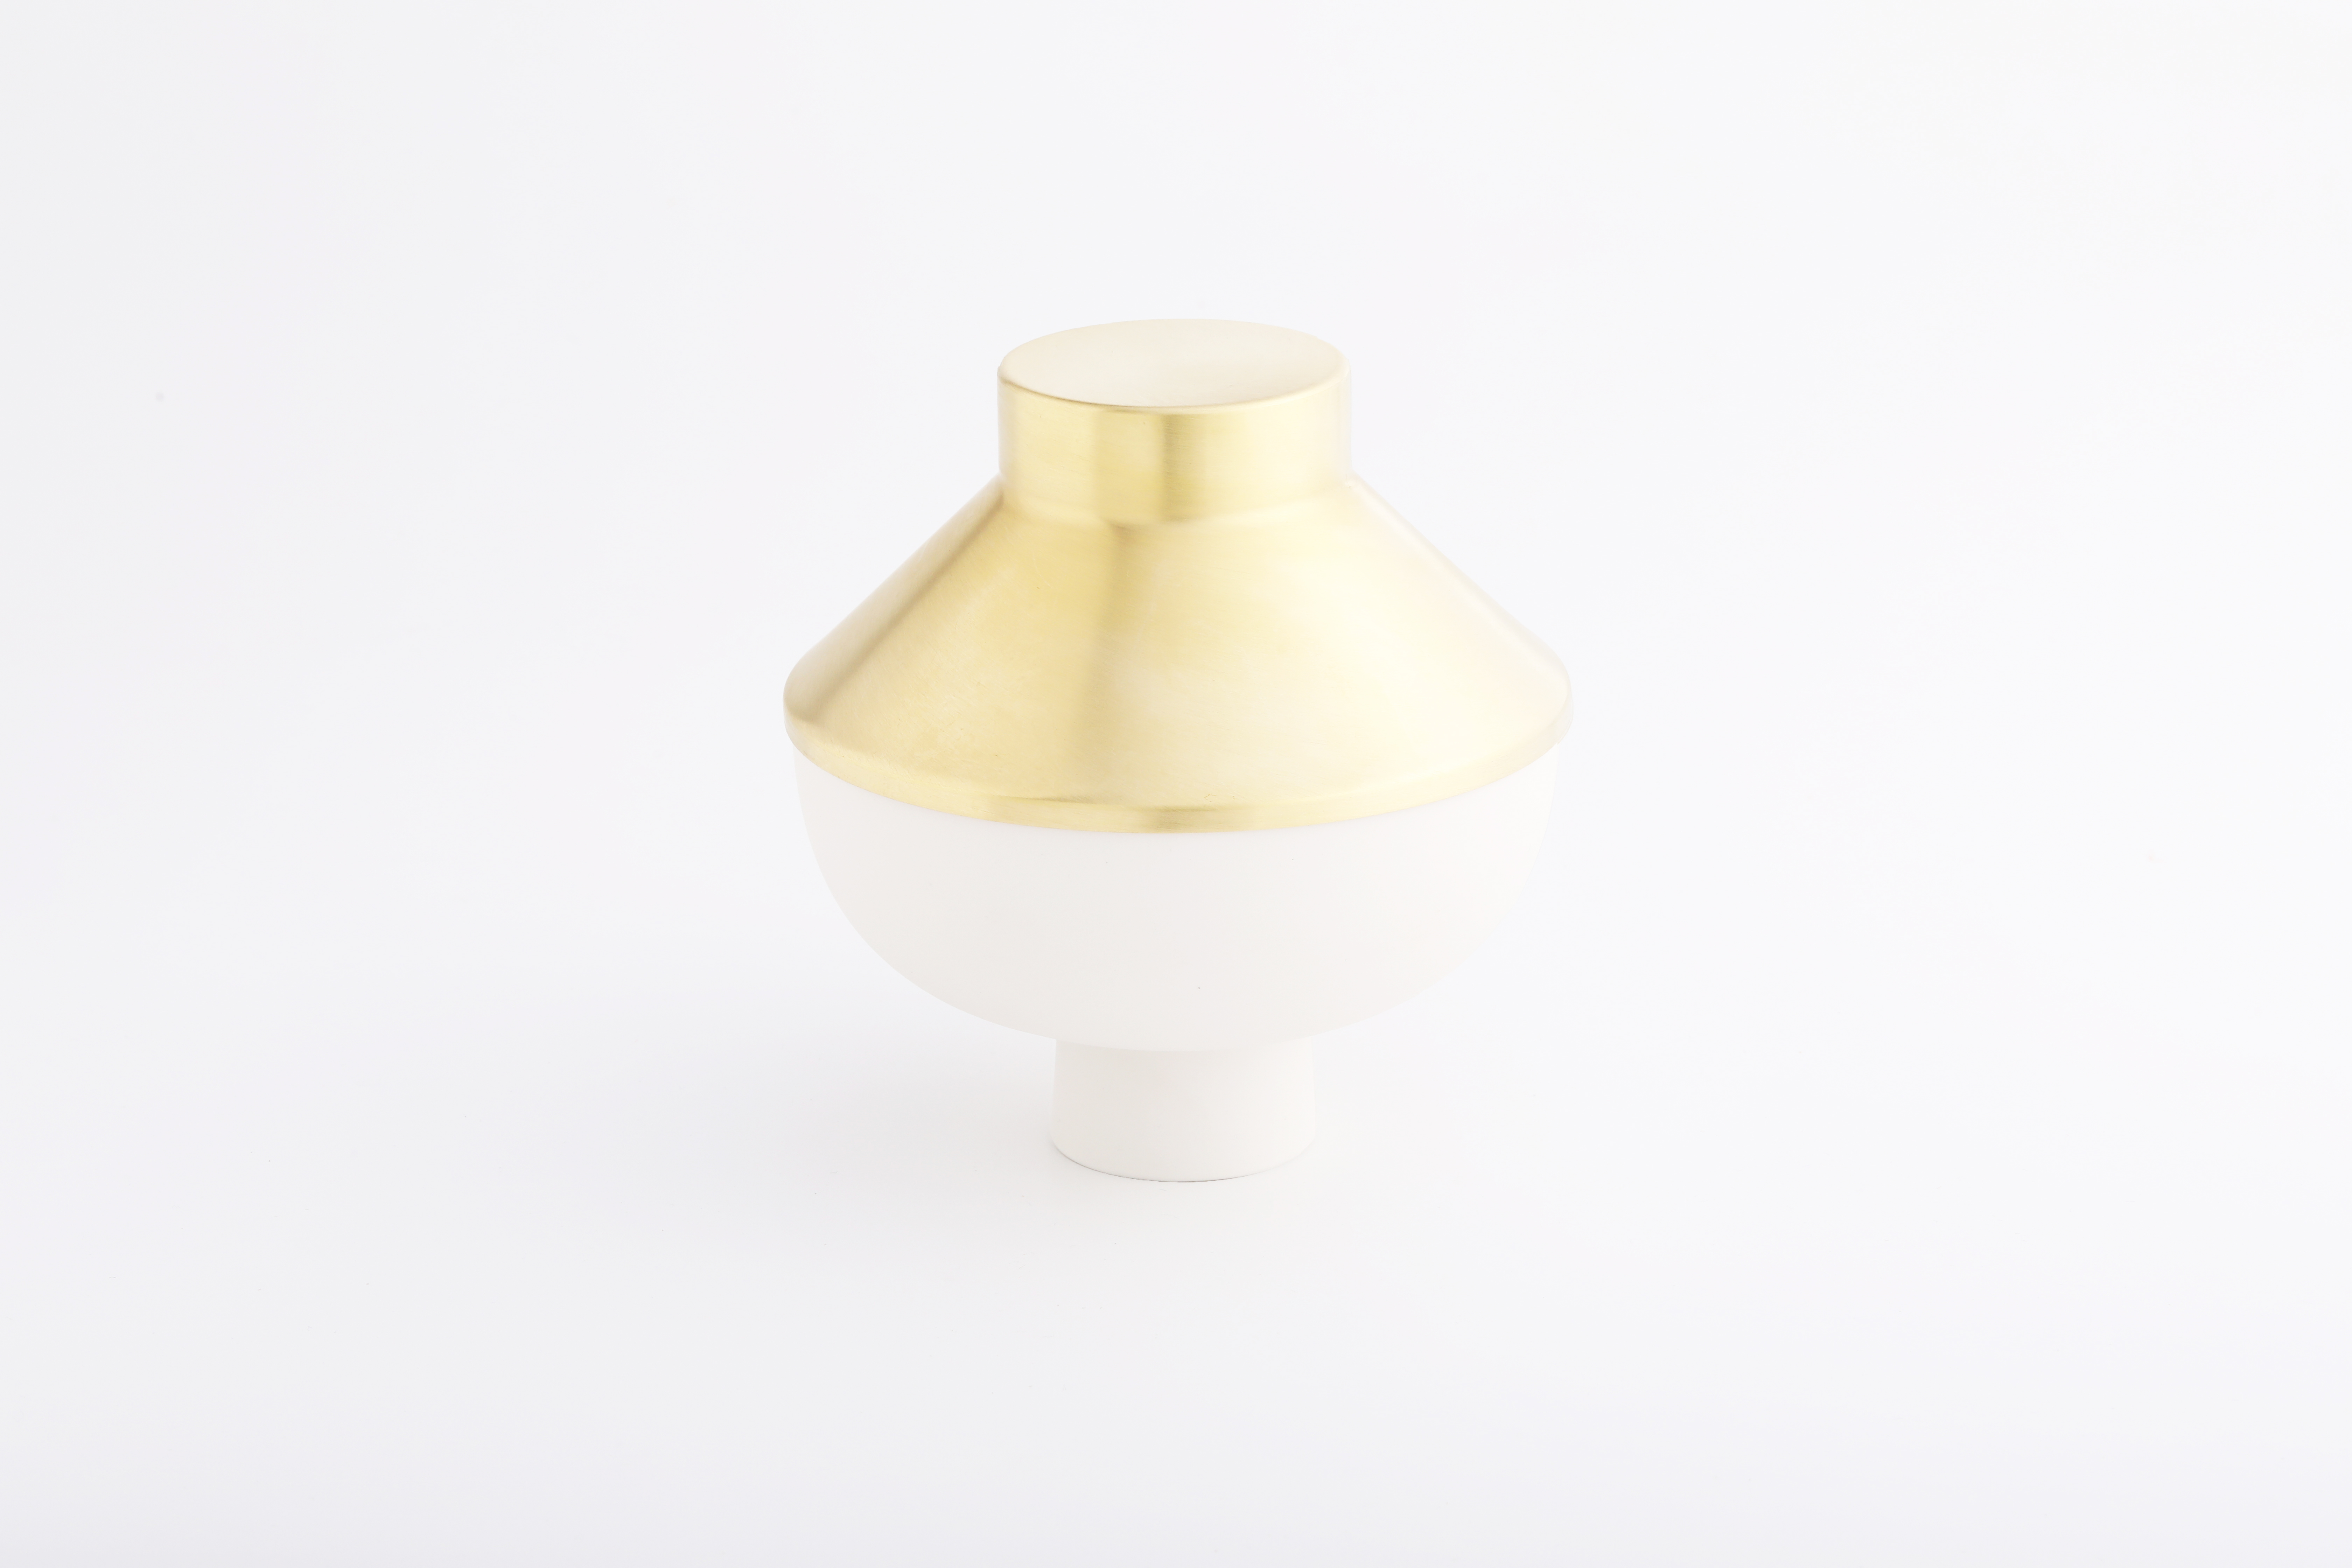 Set 3 (白瓷黃銅款 / White,Brass)